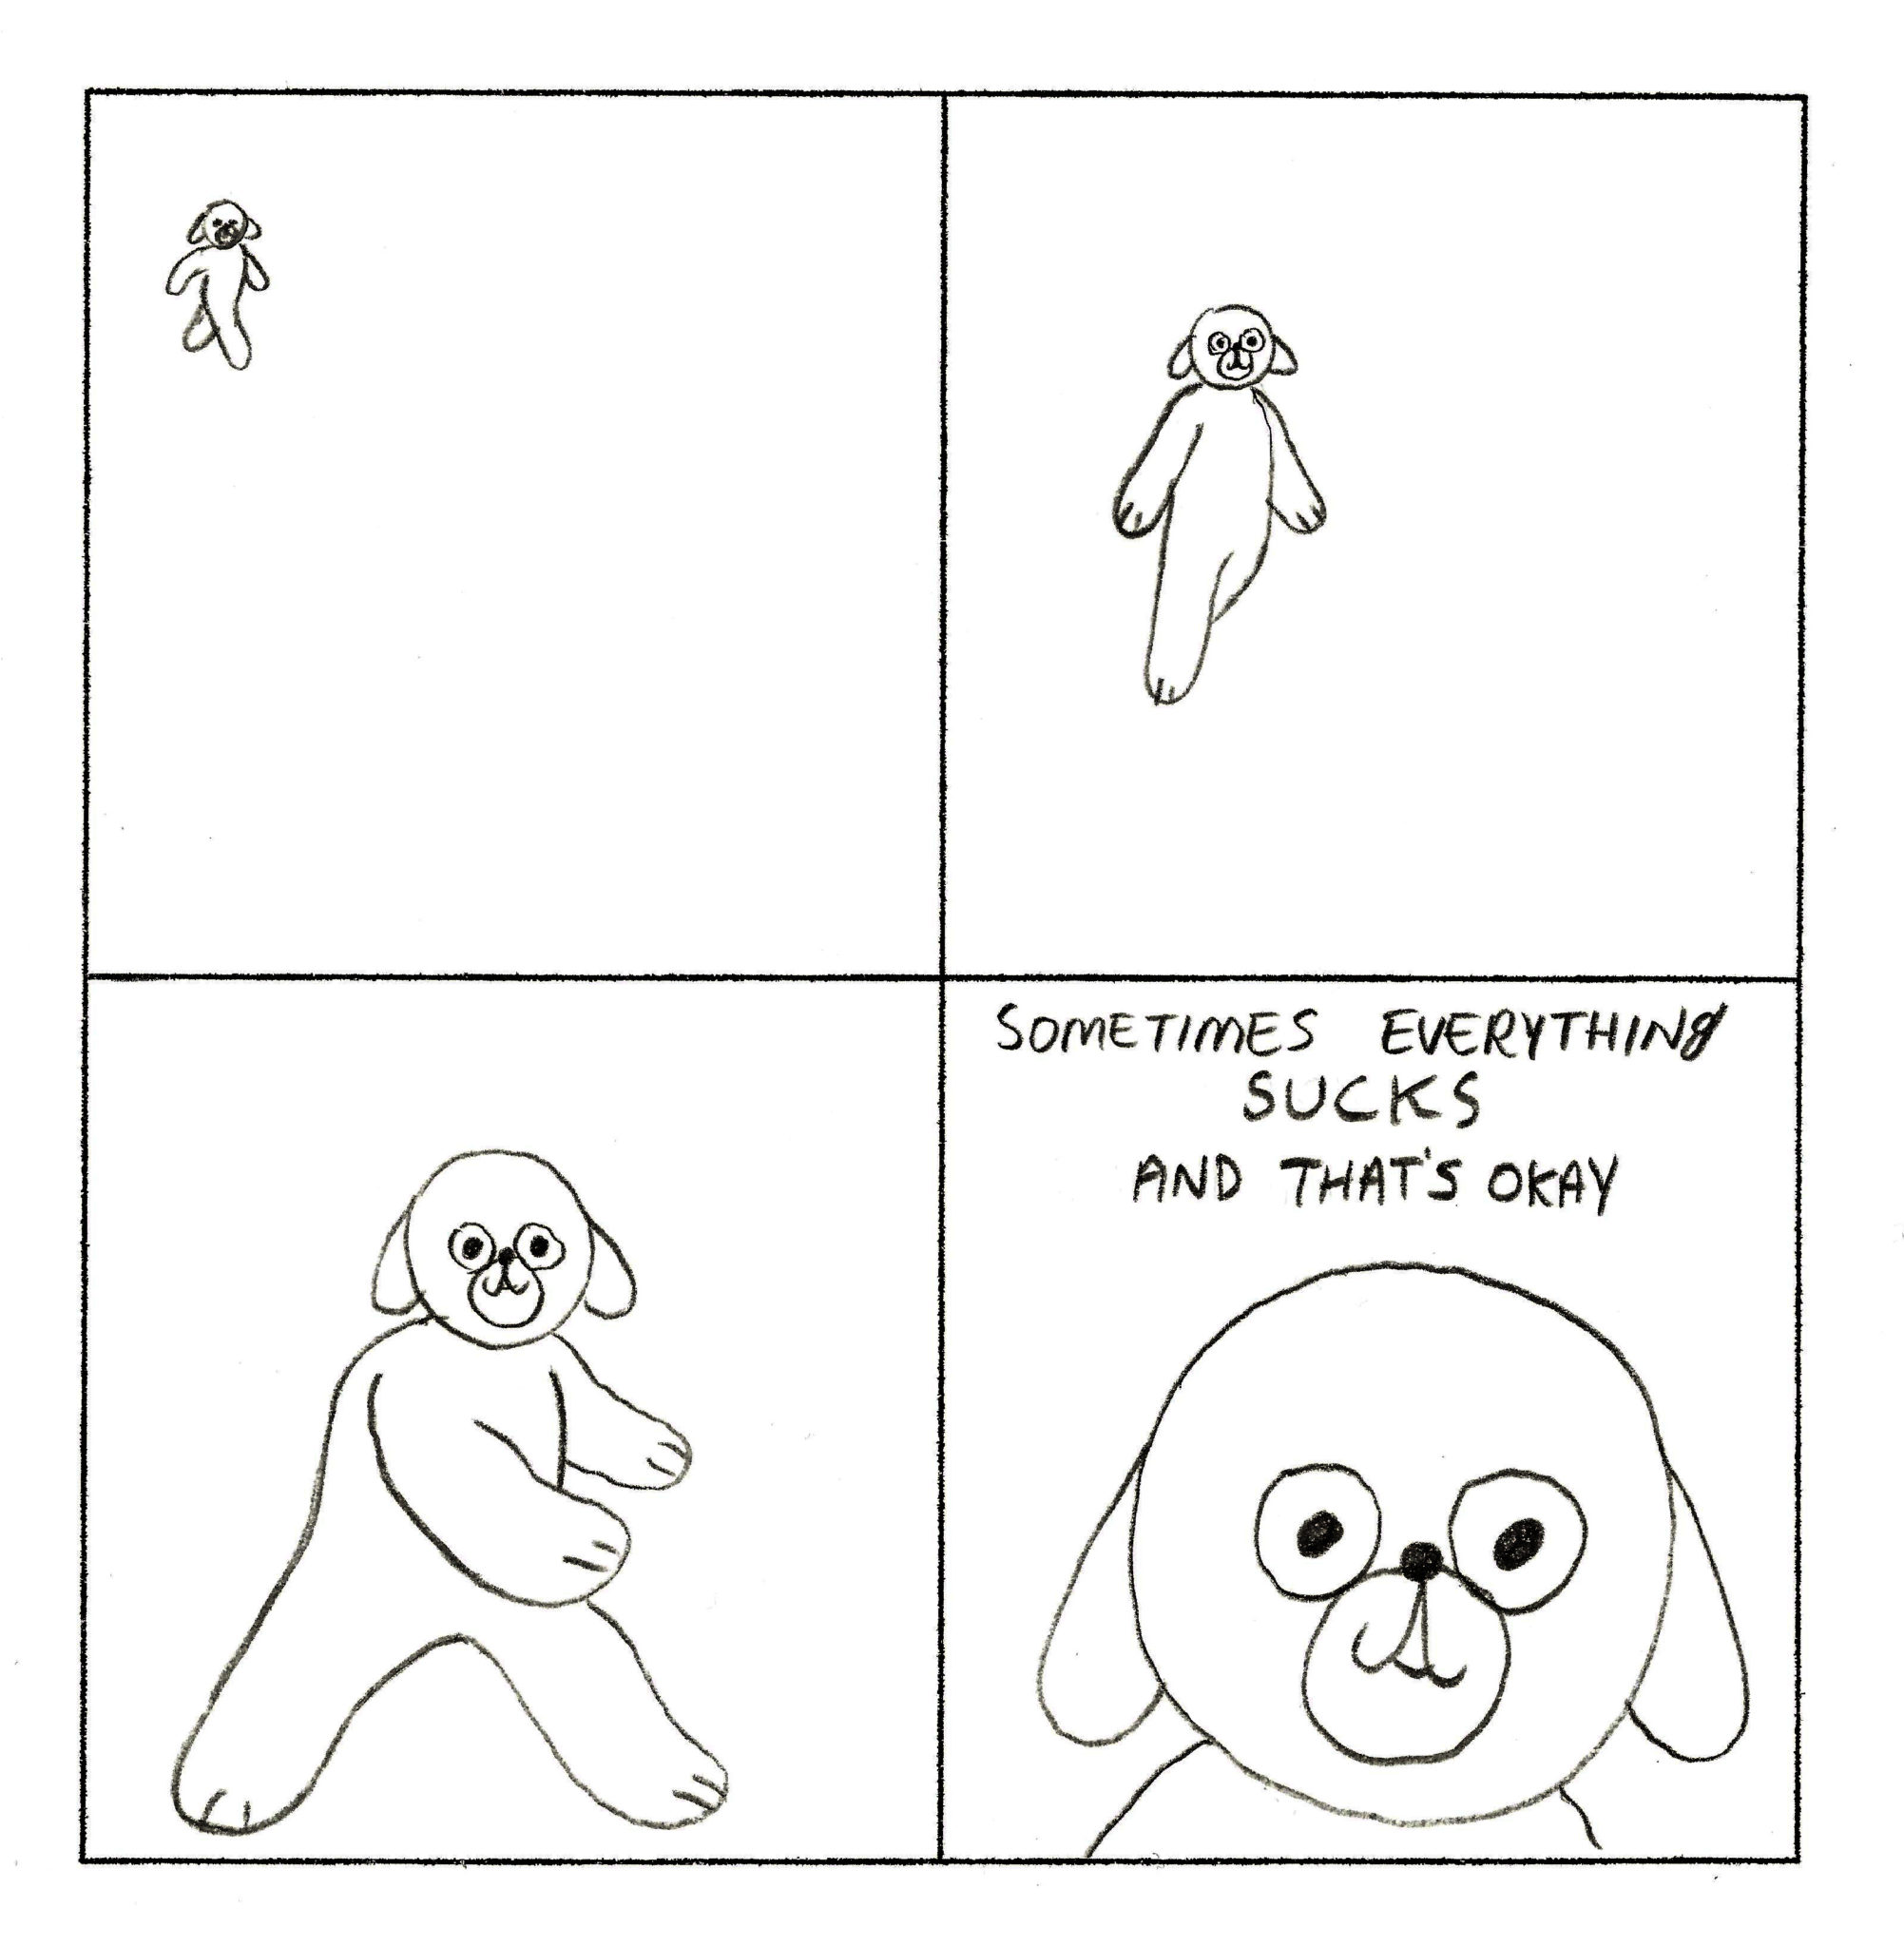 Dog Comics 201-205 - Page 1